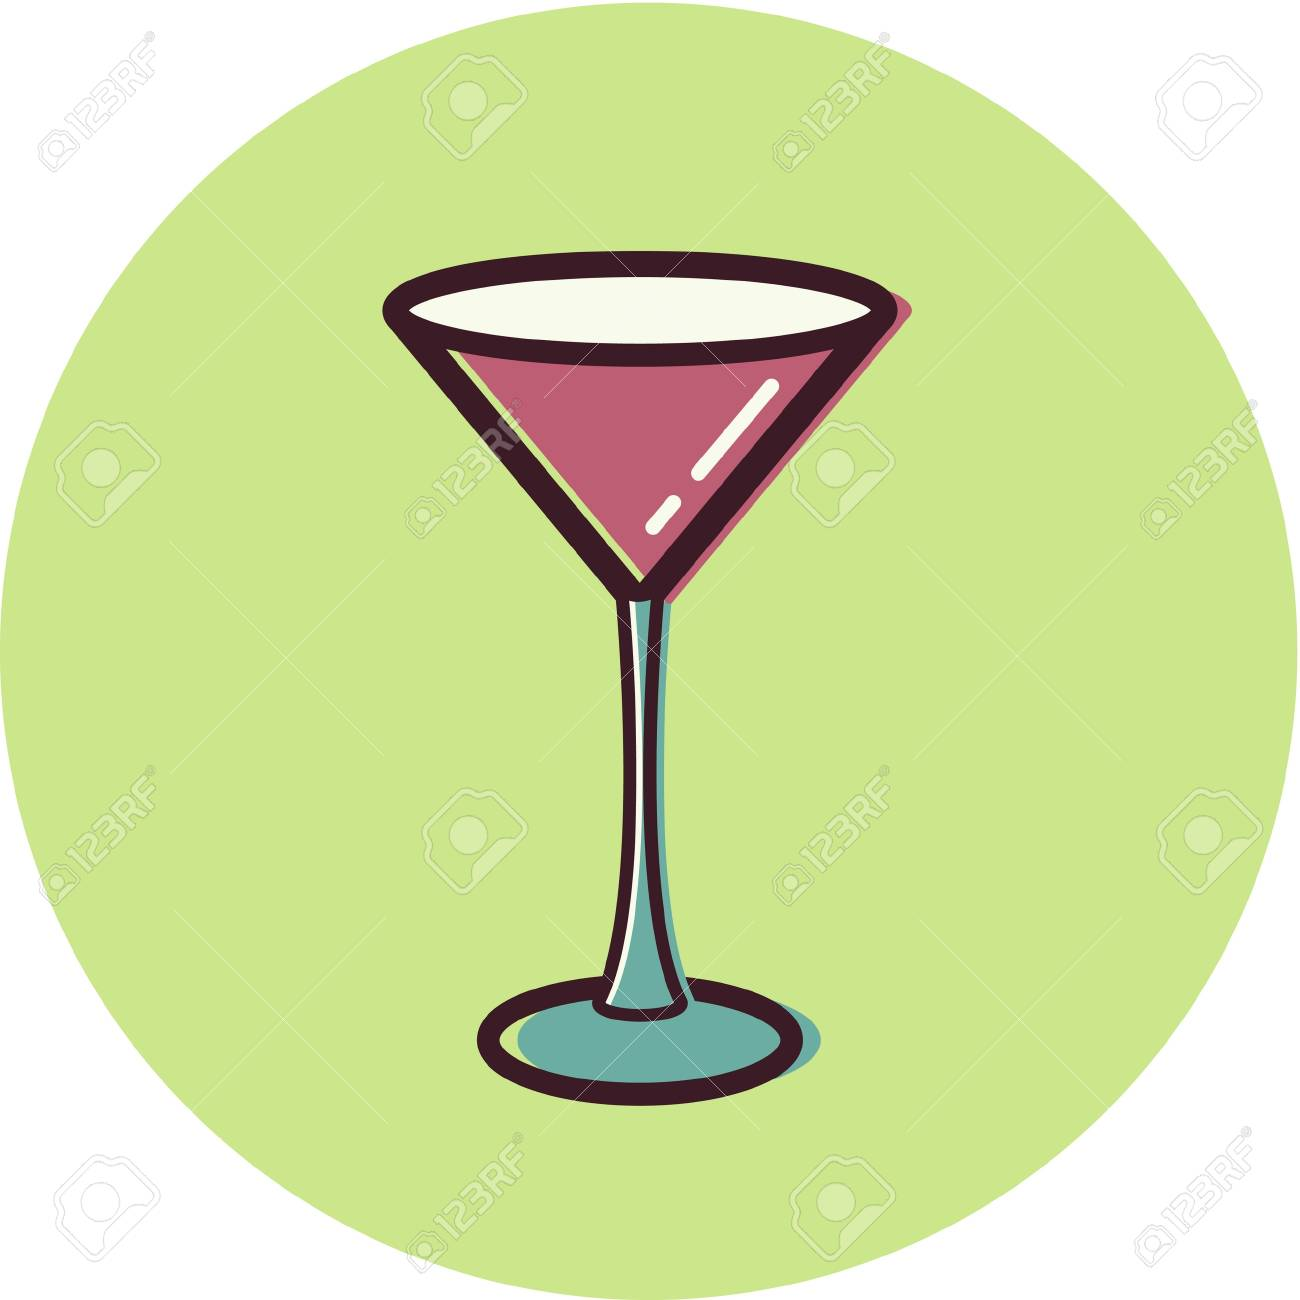 Illustration of a martini glass Stock Photo - 14864957